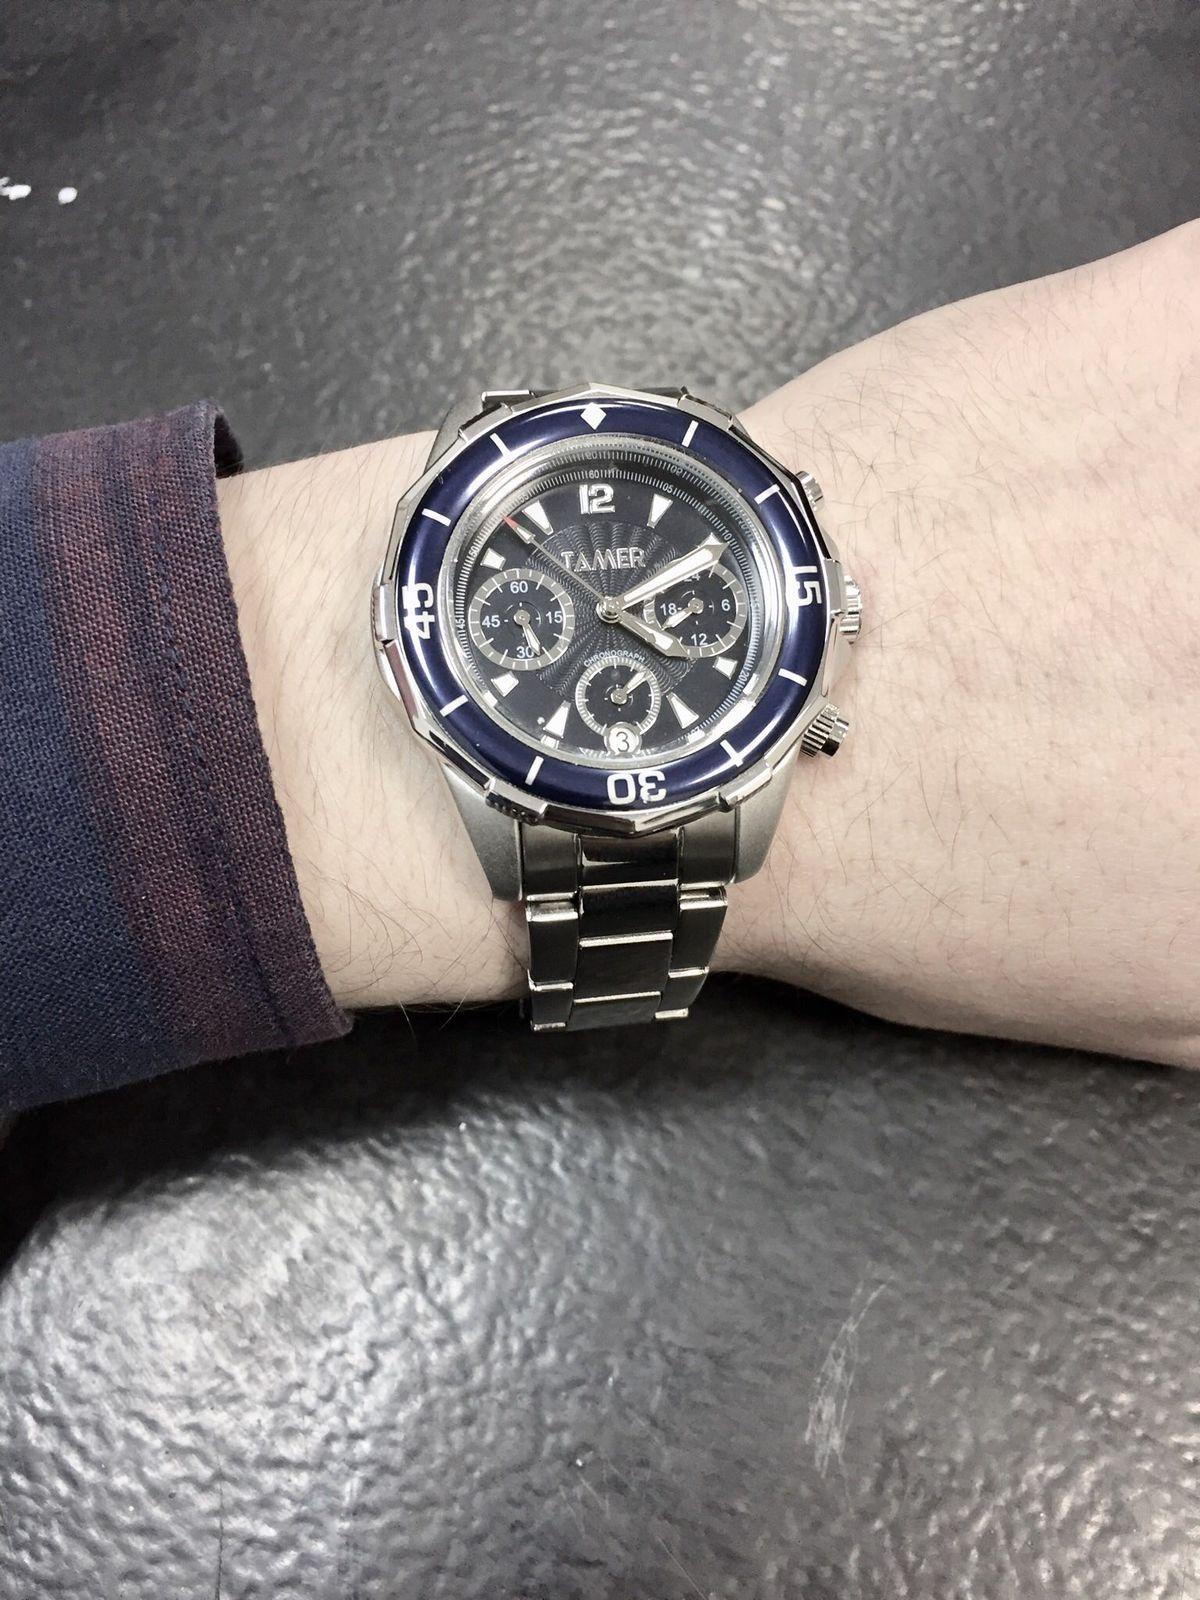 Мужские часы ⌚️⏳💸